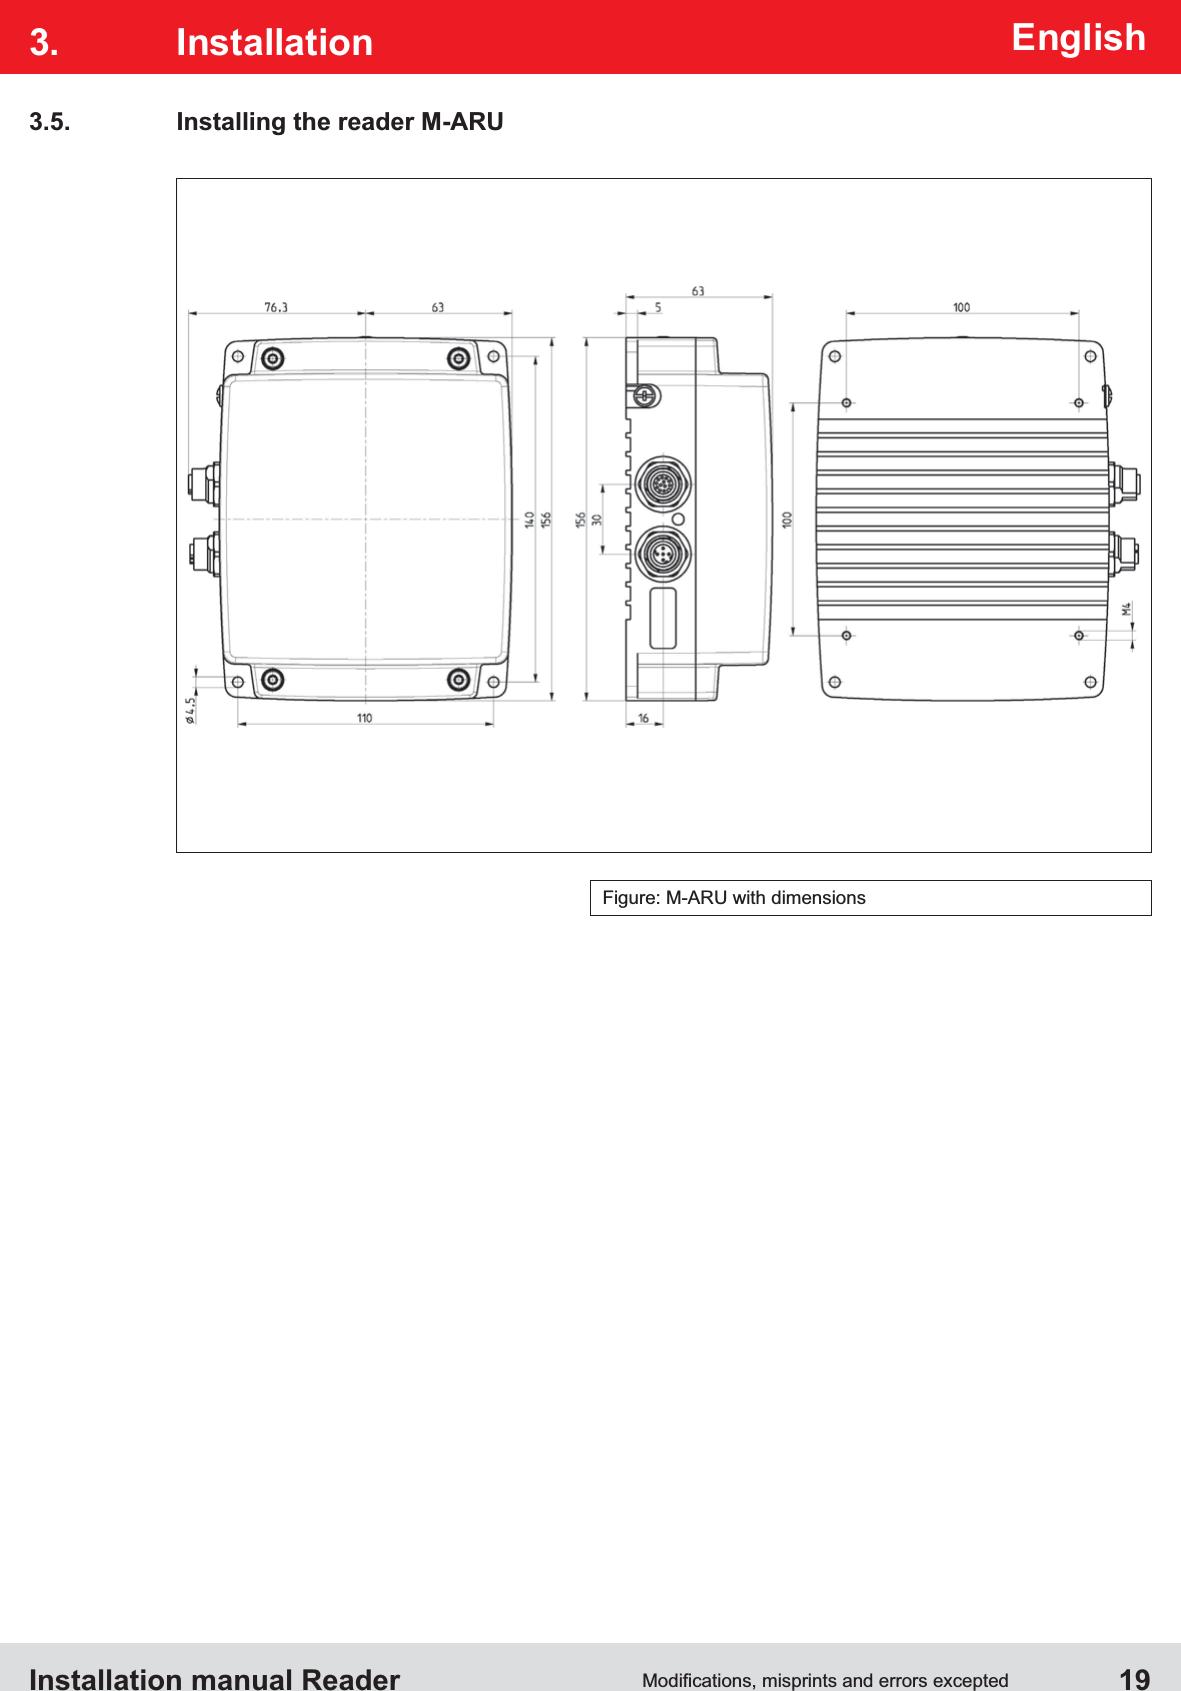 Installation manual Reader  19EnglishFigure: M-ARU with dimensions3. Installation3.5.  Installing the reader M-ARU